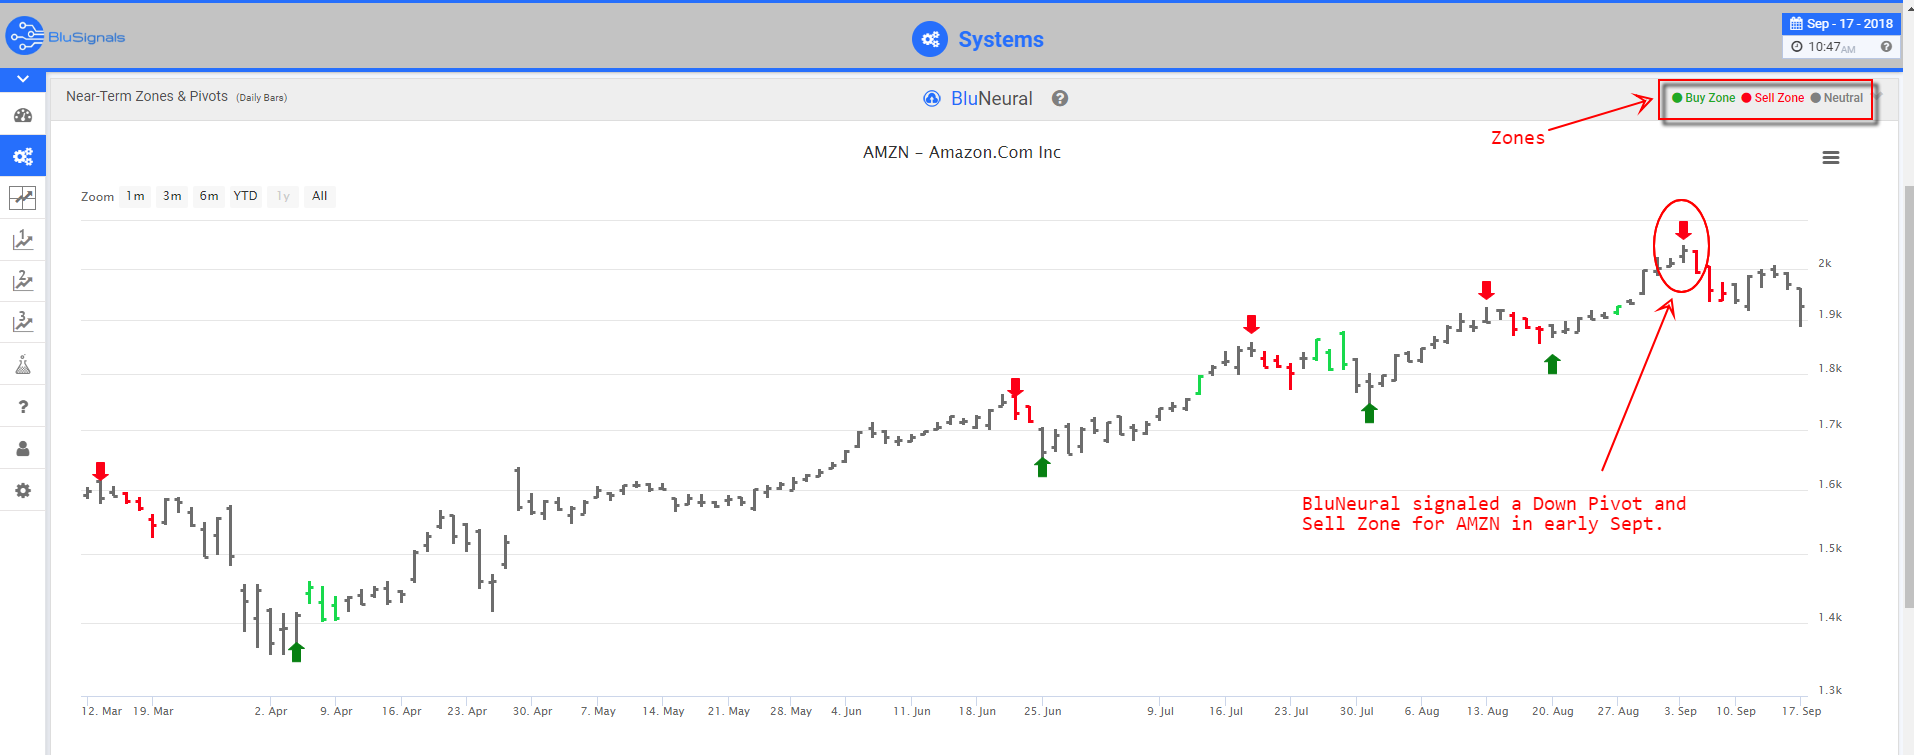 AMZN trade signal